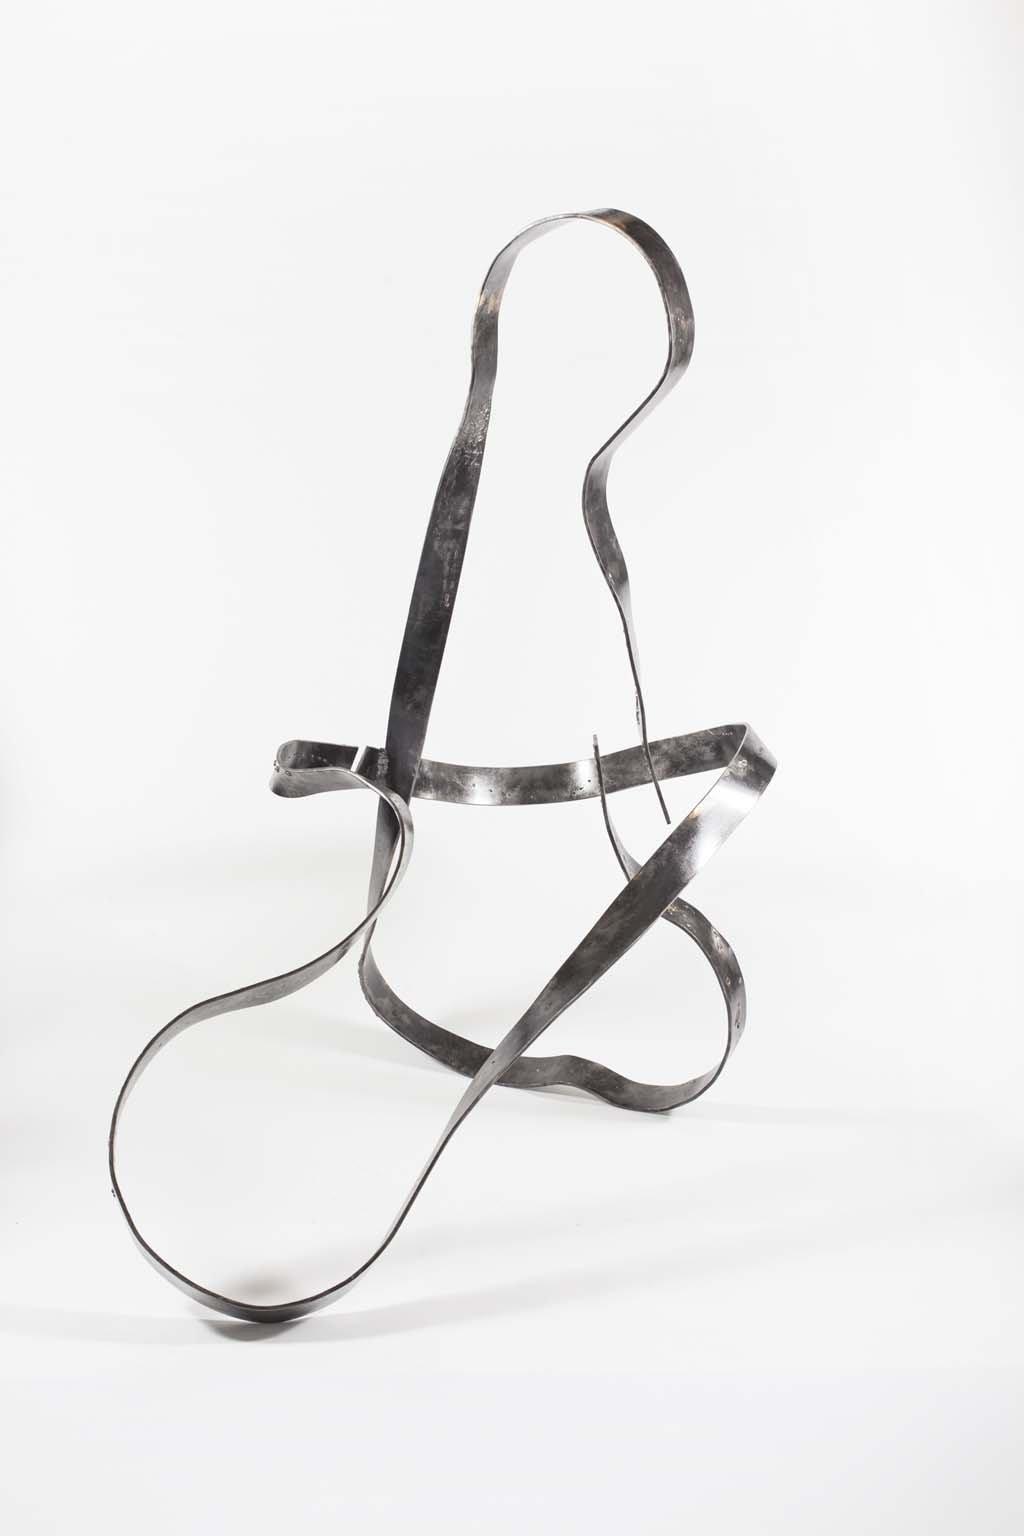 Oblivion VIII |2017 | Iron & brass Sculpture| 160x160x60 cm | Rami Ater